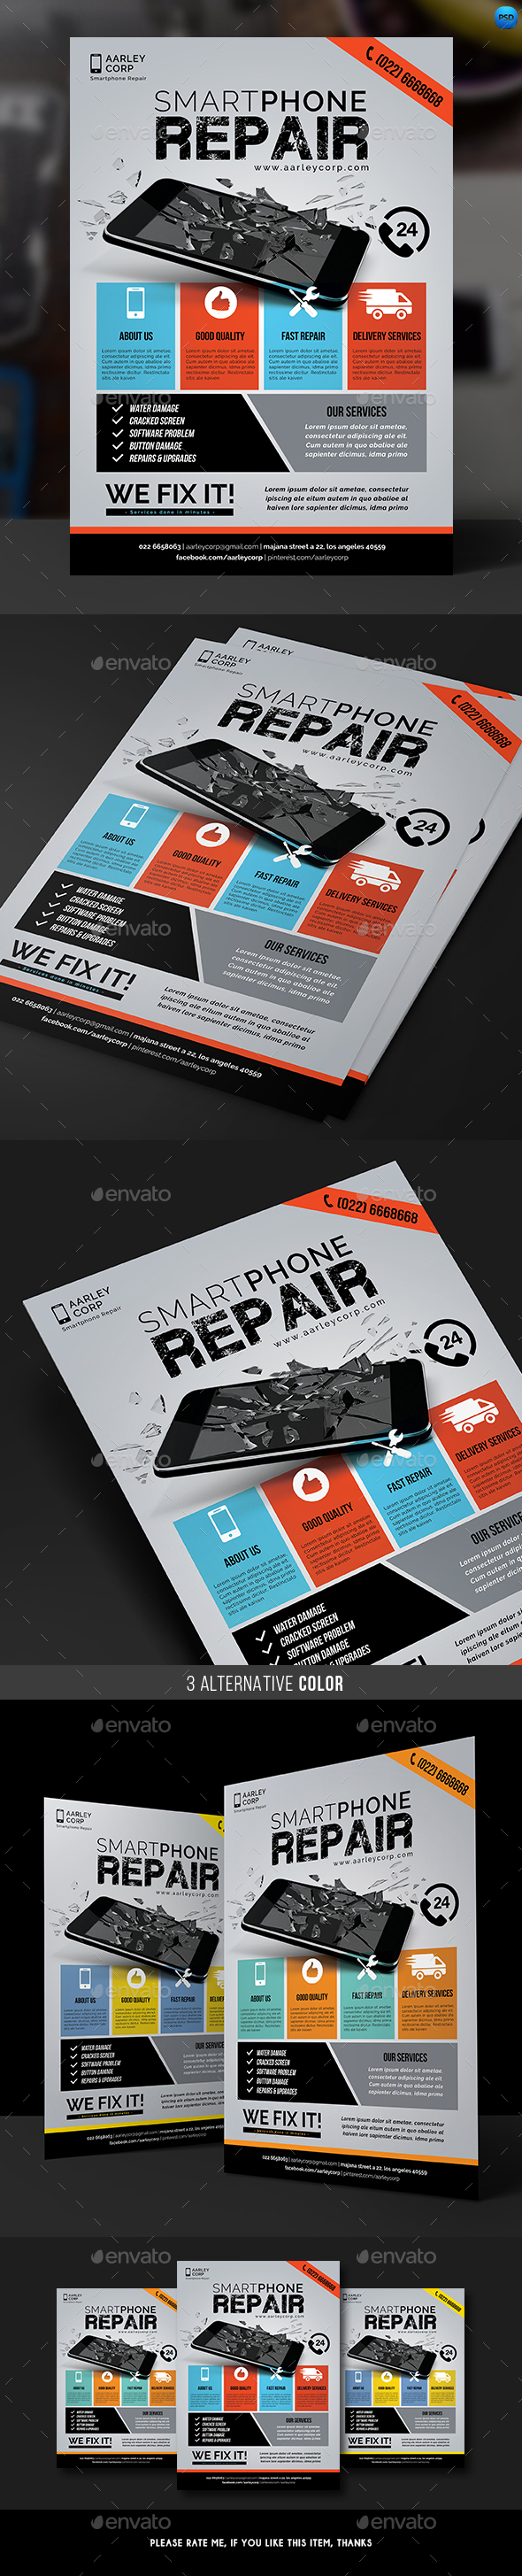 Smartphone Repair Flyer - Corporate Flyers